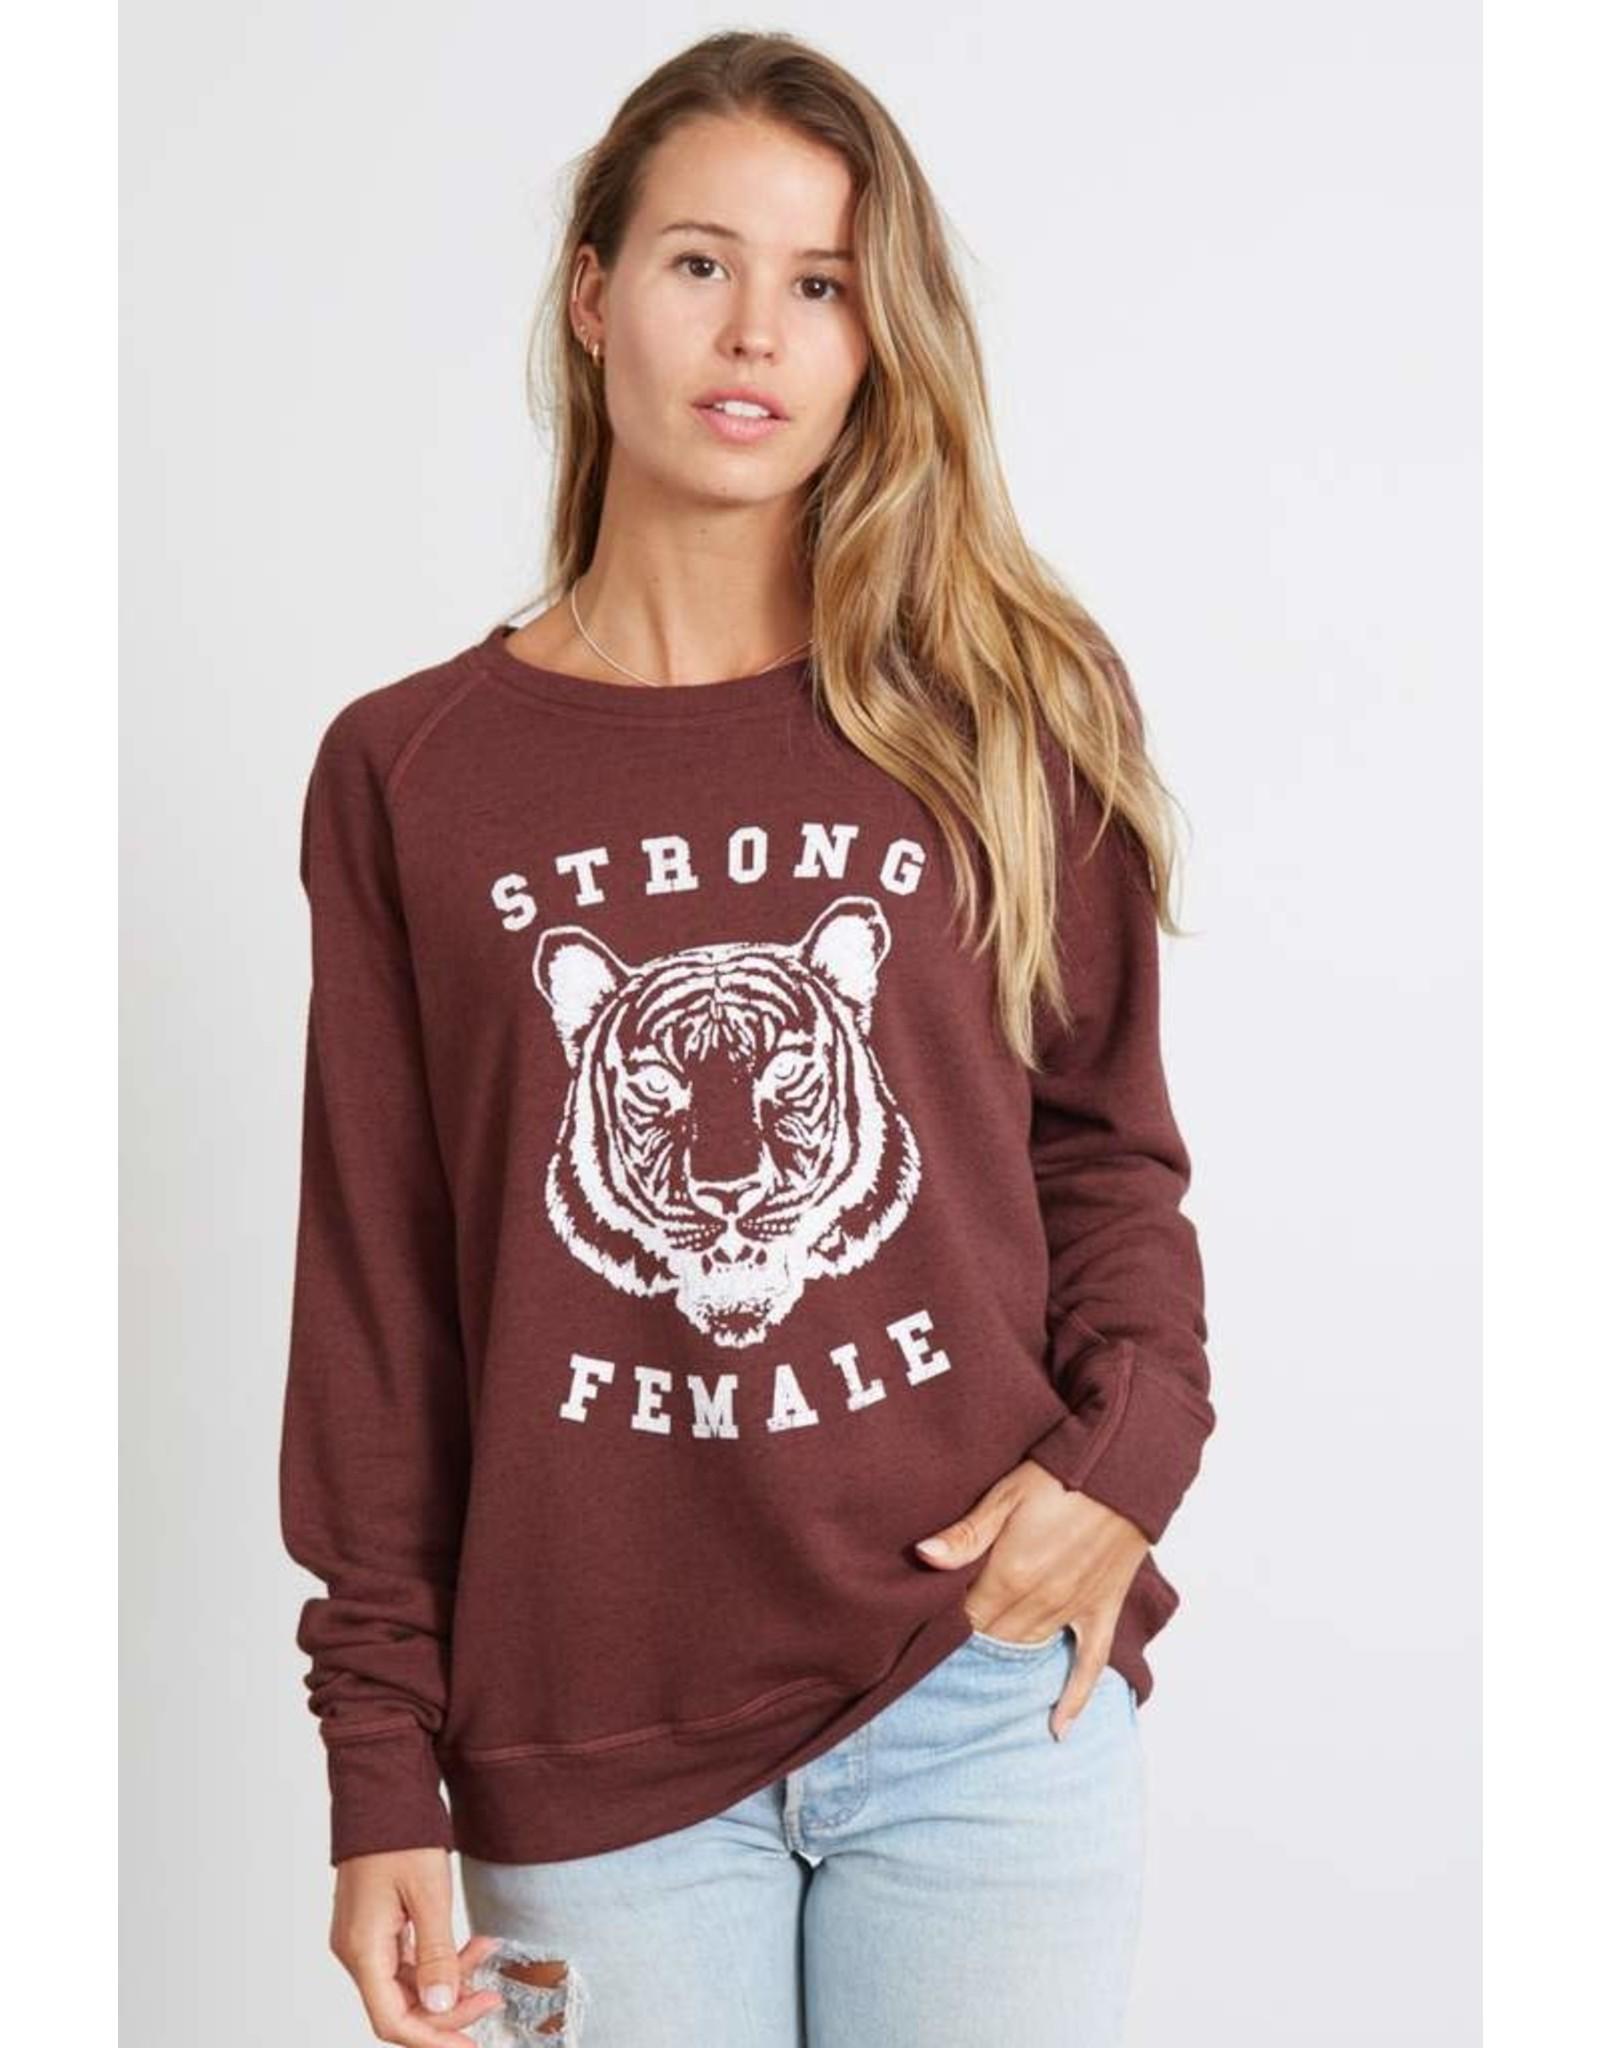 good hYOUman good hYOUman - Smith sweatshirt - Strong Female